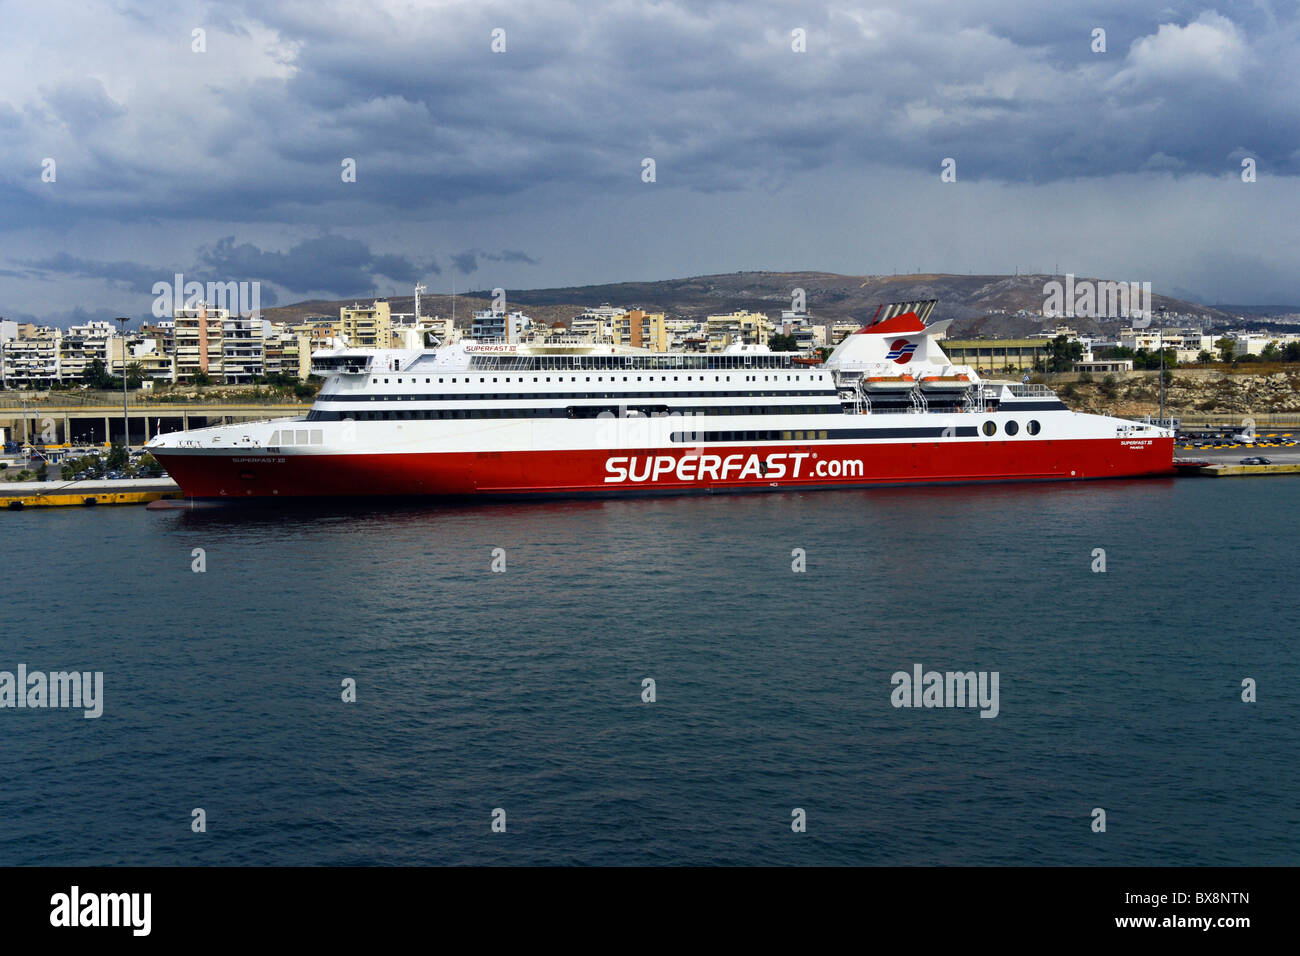 Superfast Ferries passenger car ferry Superfast XI in Piraeus harbour Greece Stock Photo